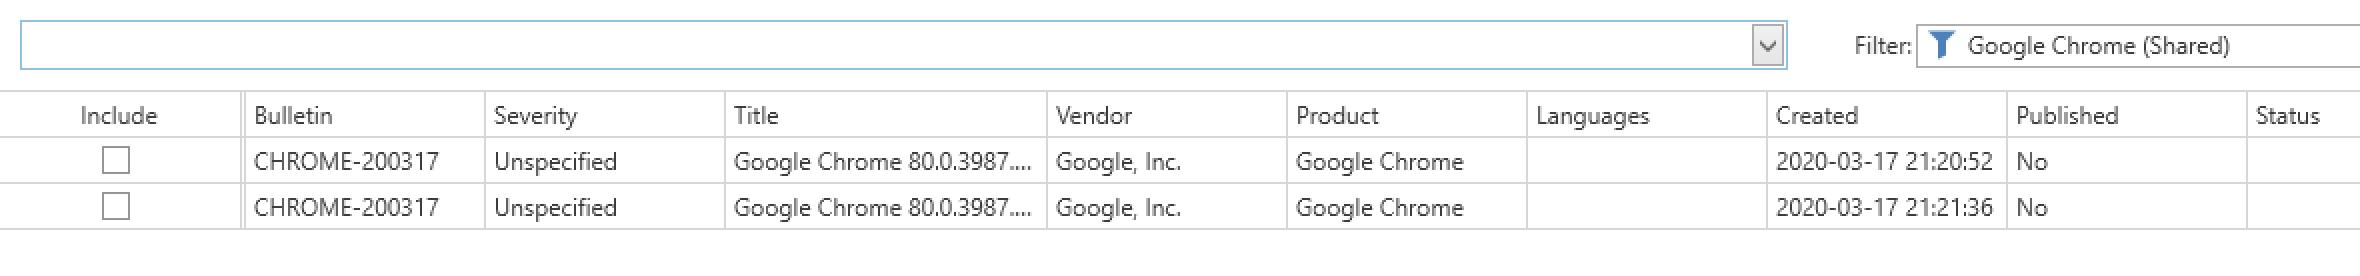 Google Chrome Smart Filter Results